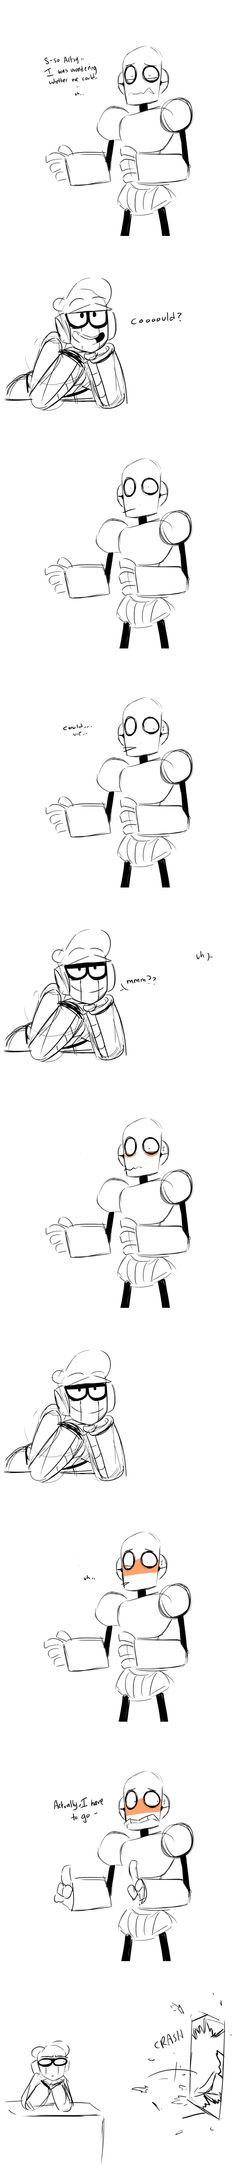 Artman: Uh.. okay